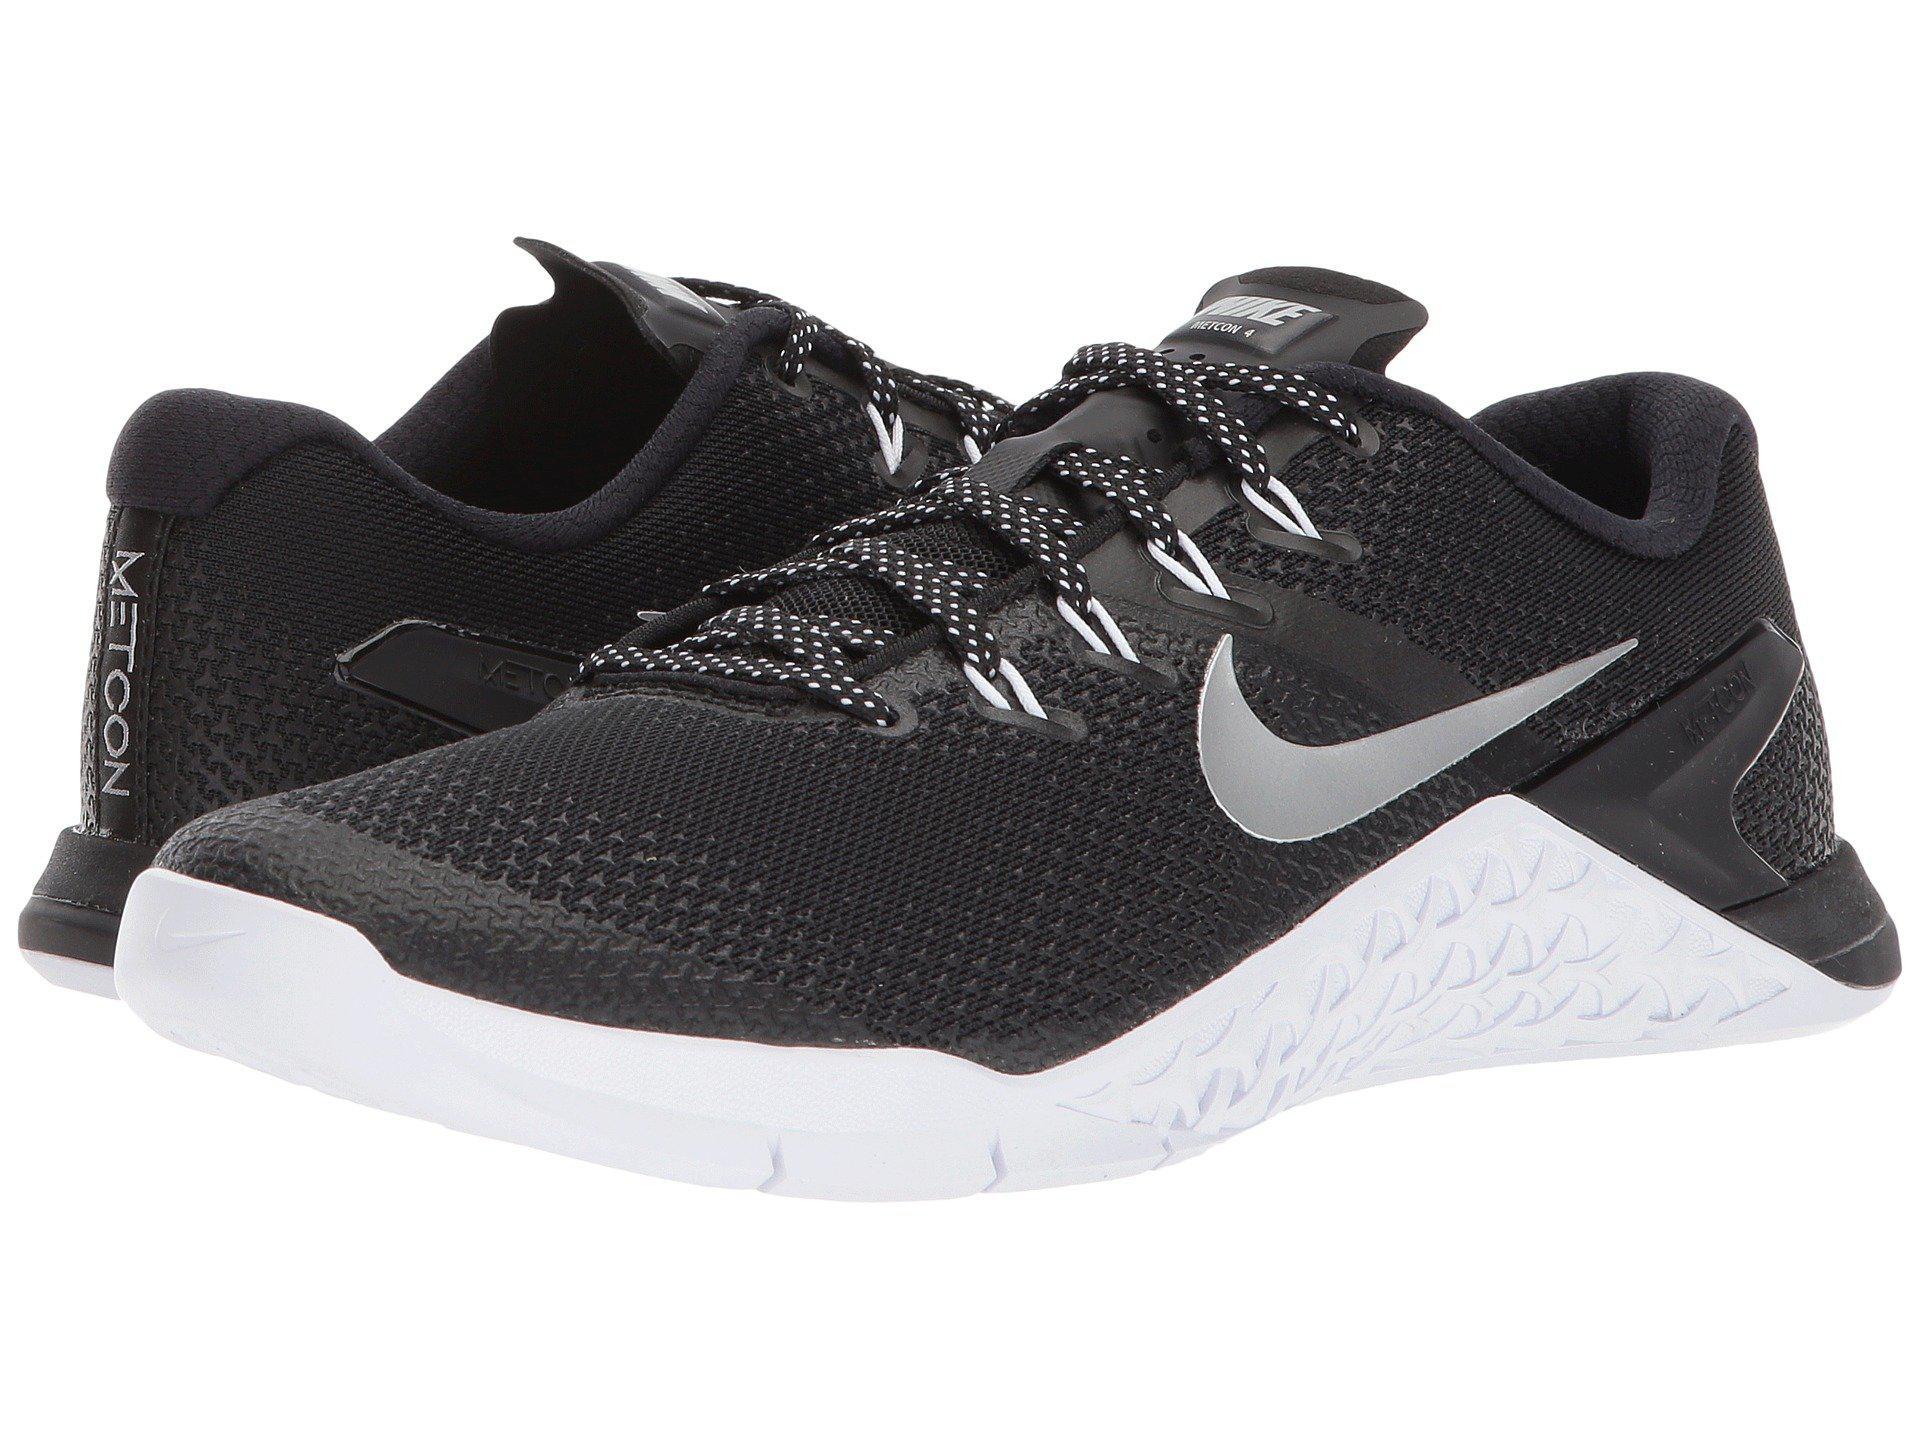 wholesale dealer dc53a 658c5 Nike. Metcon 4 (black metallic Silver white volt Glow) Women s Shoes